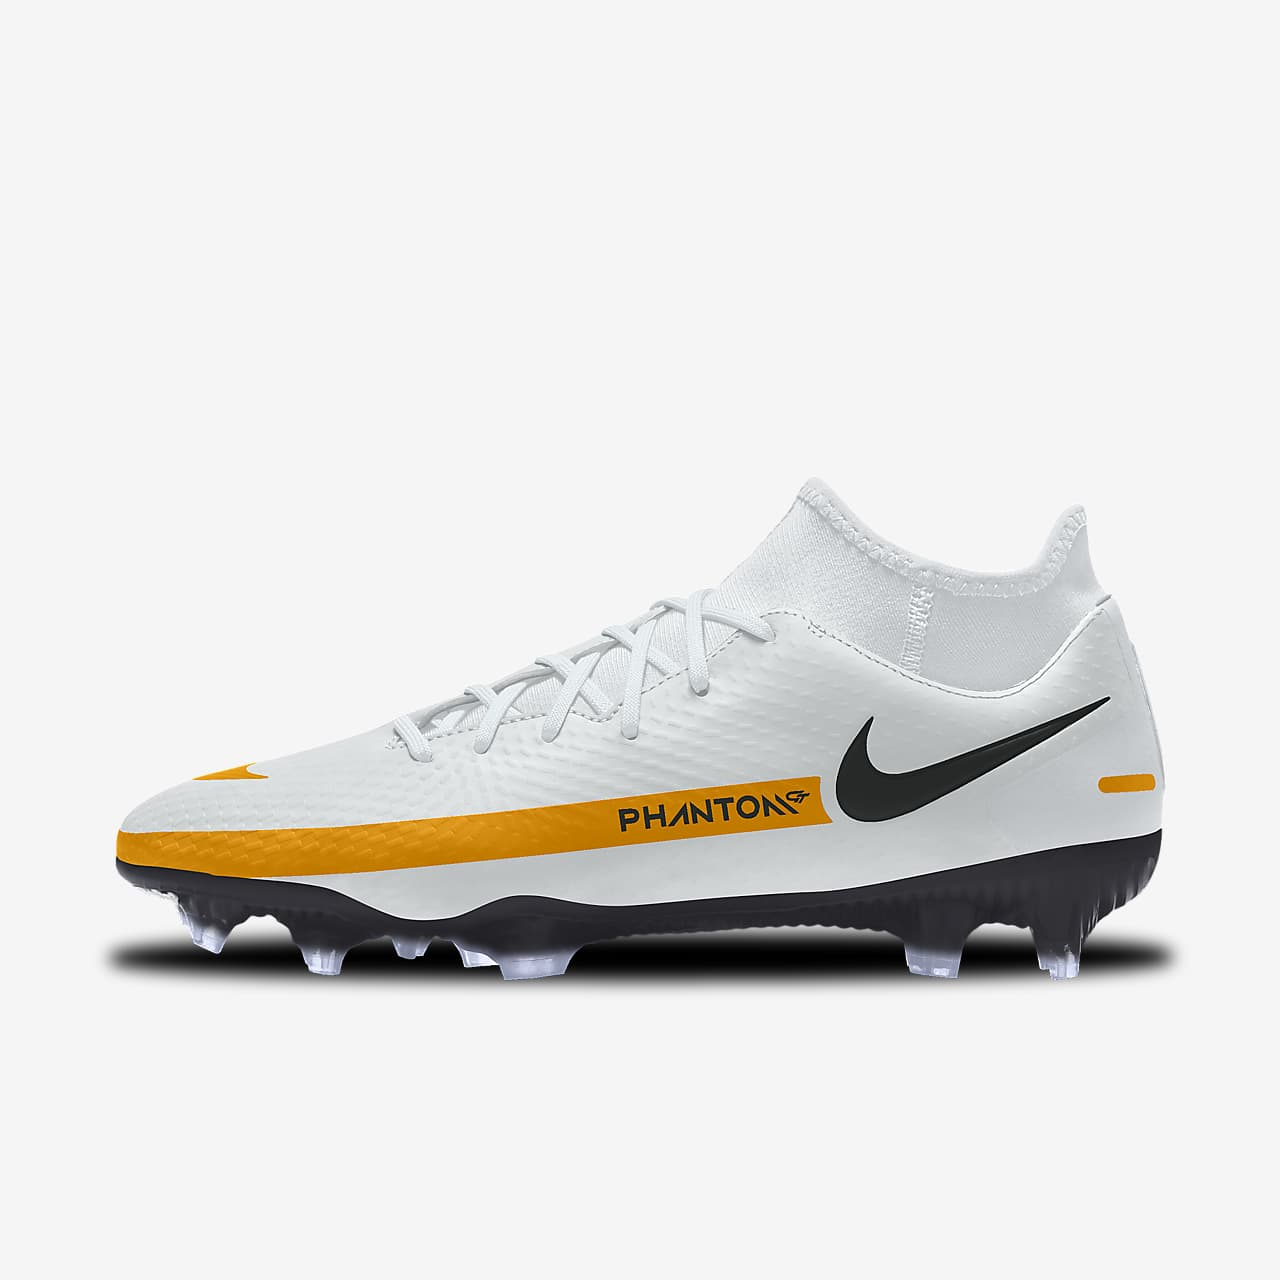 Nike Phantom GT Academy By You Custom Multi-Ground Soccer Cleat